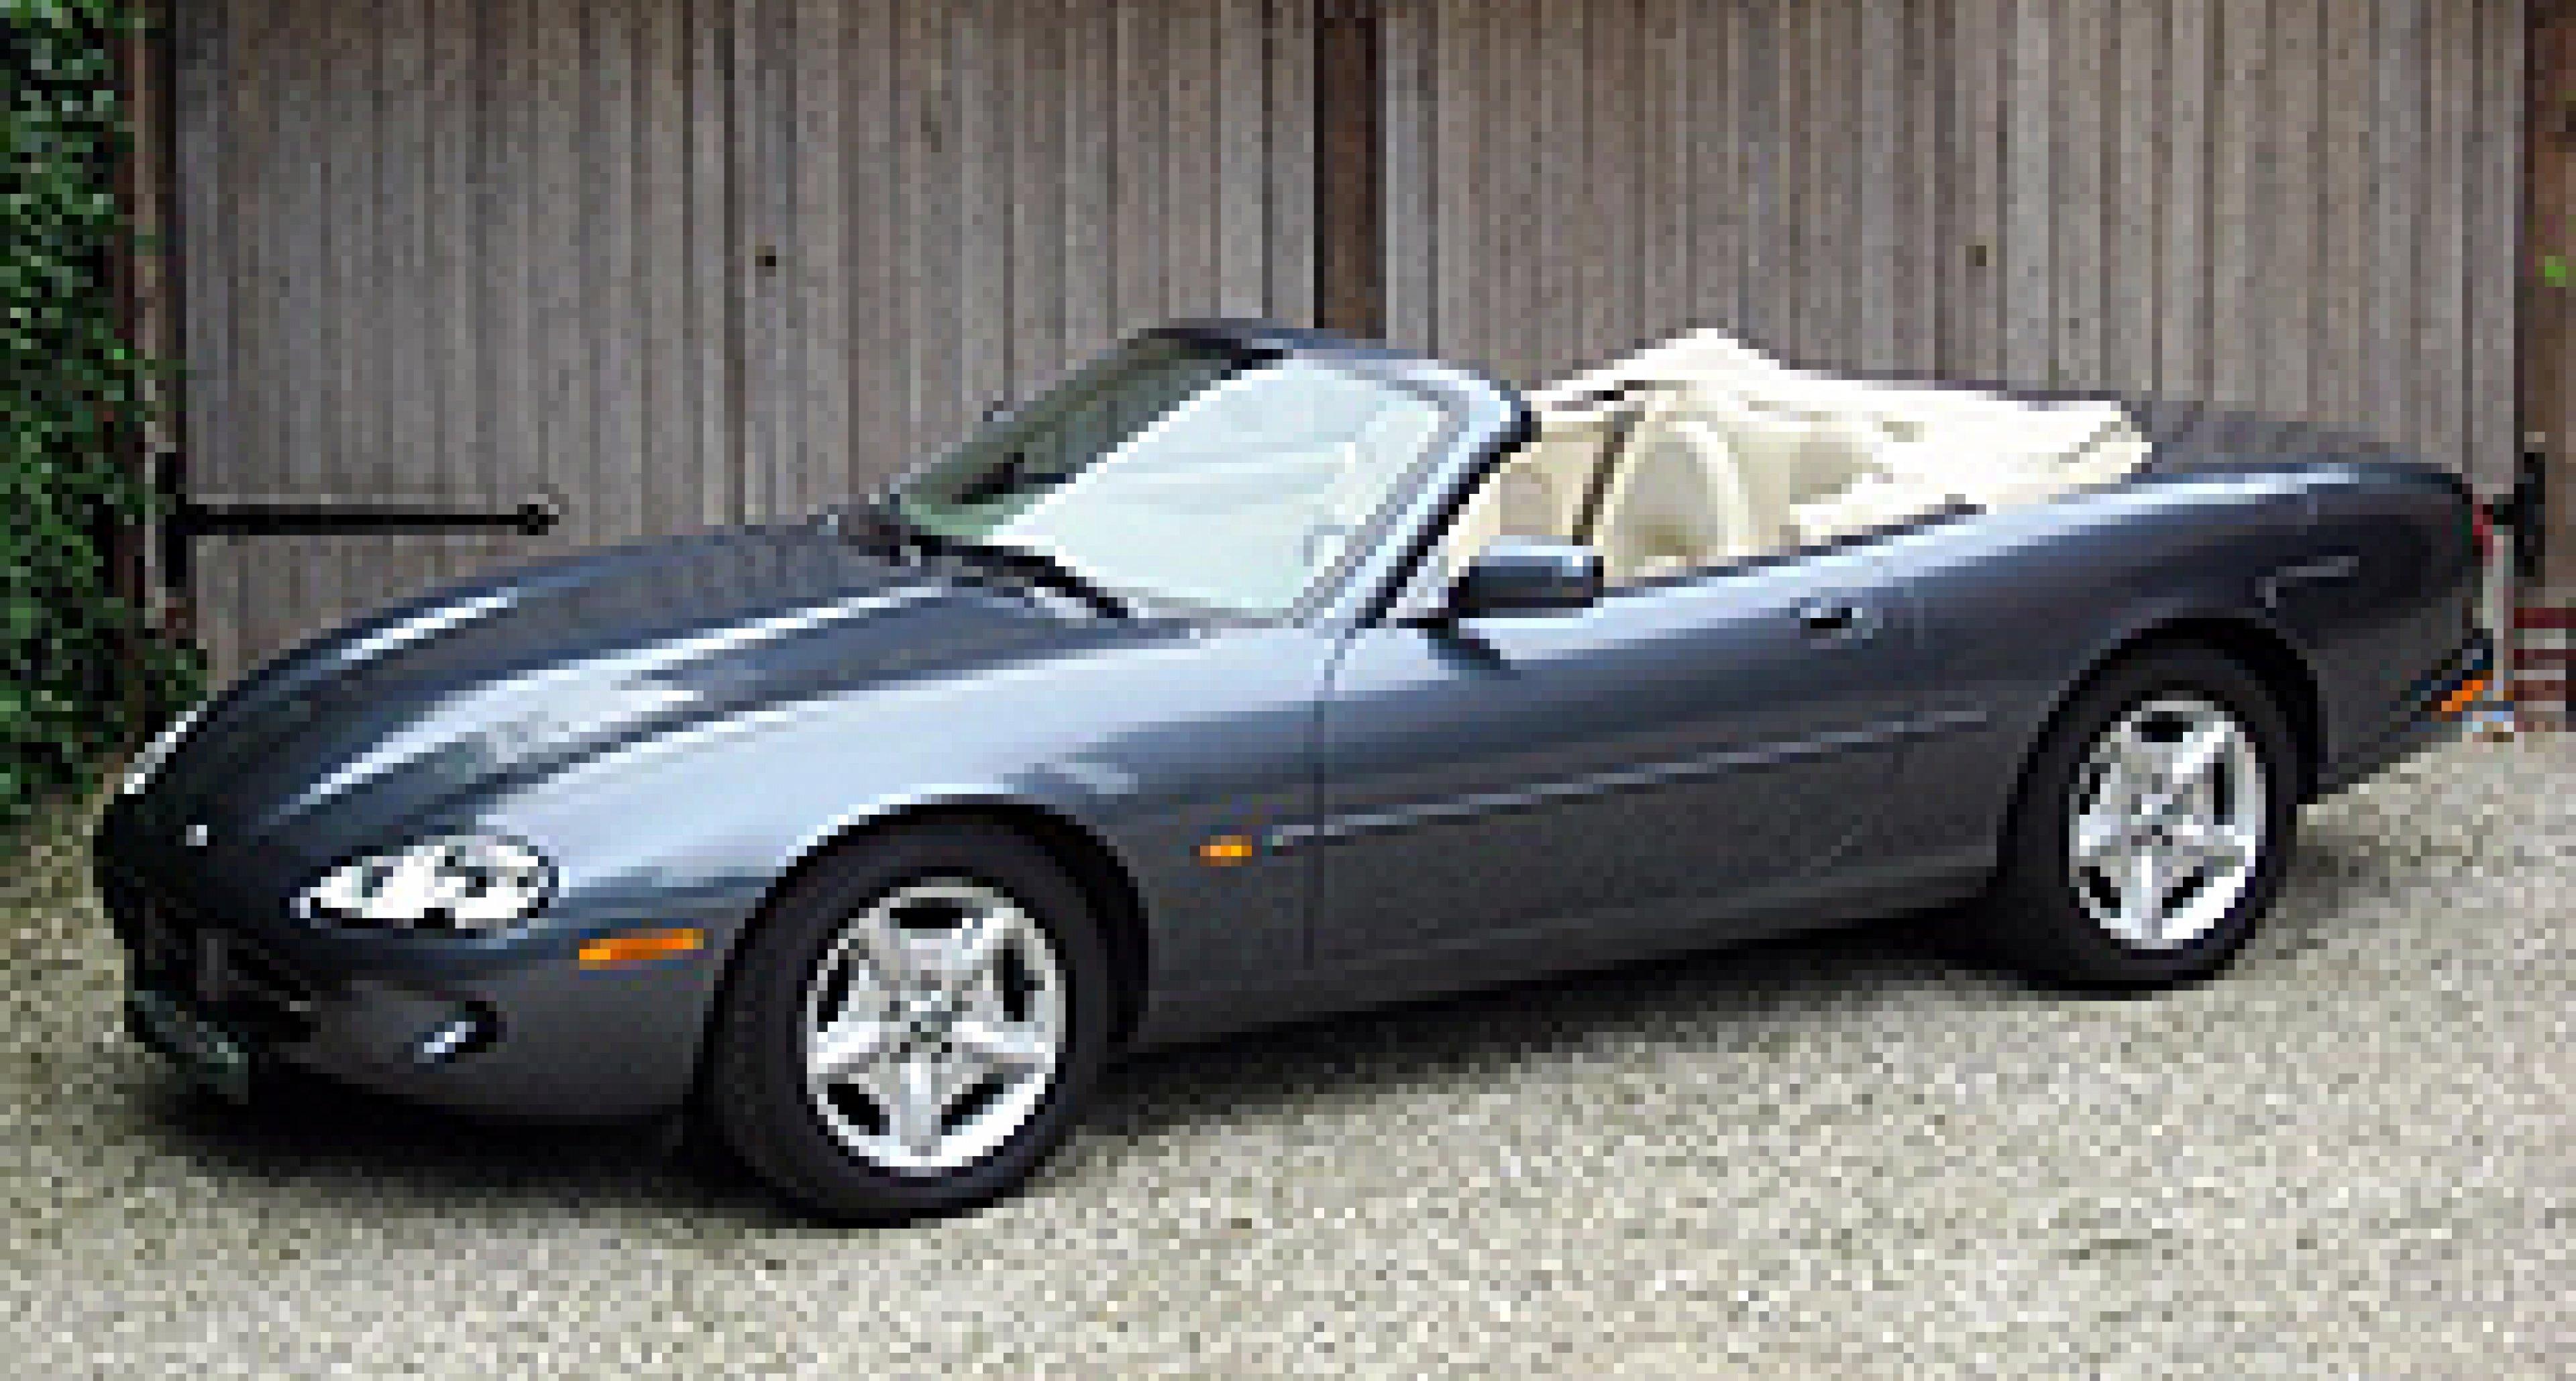 Editor's Choice: Jaguar XK8 Cabrio